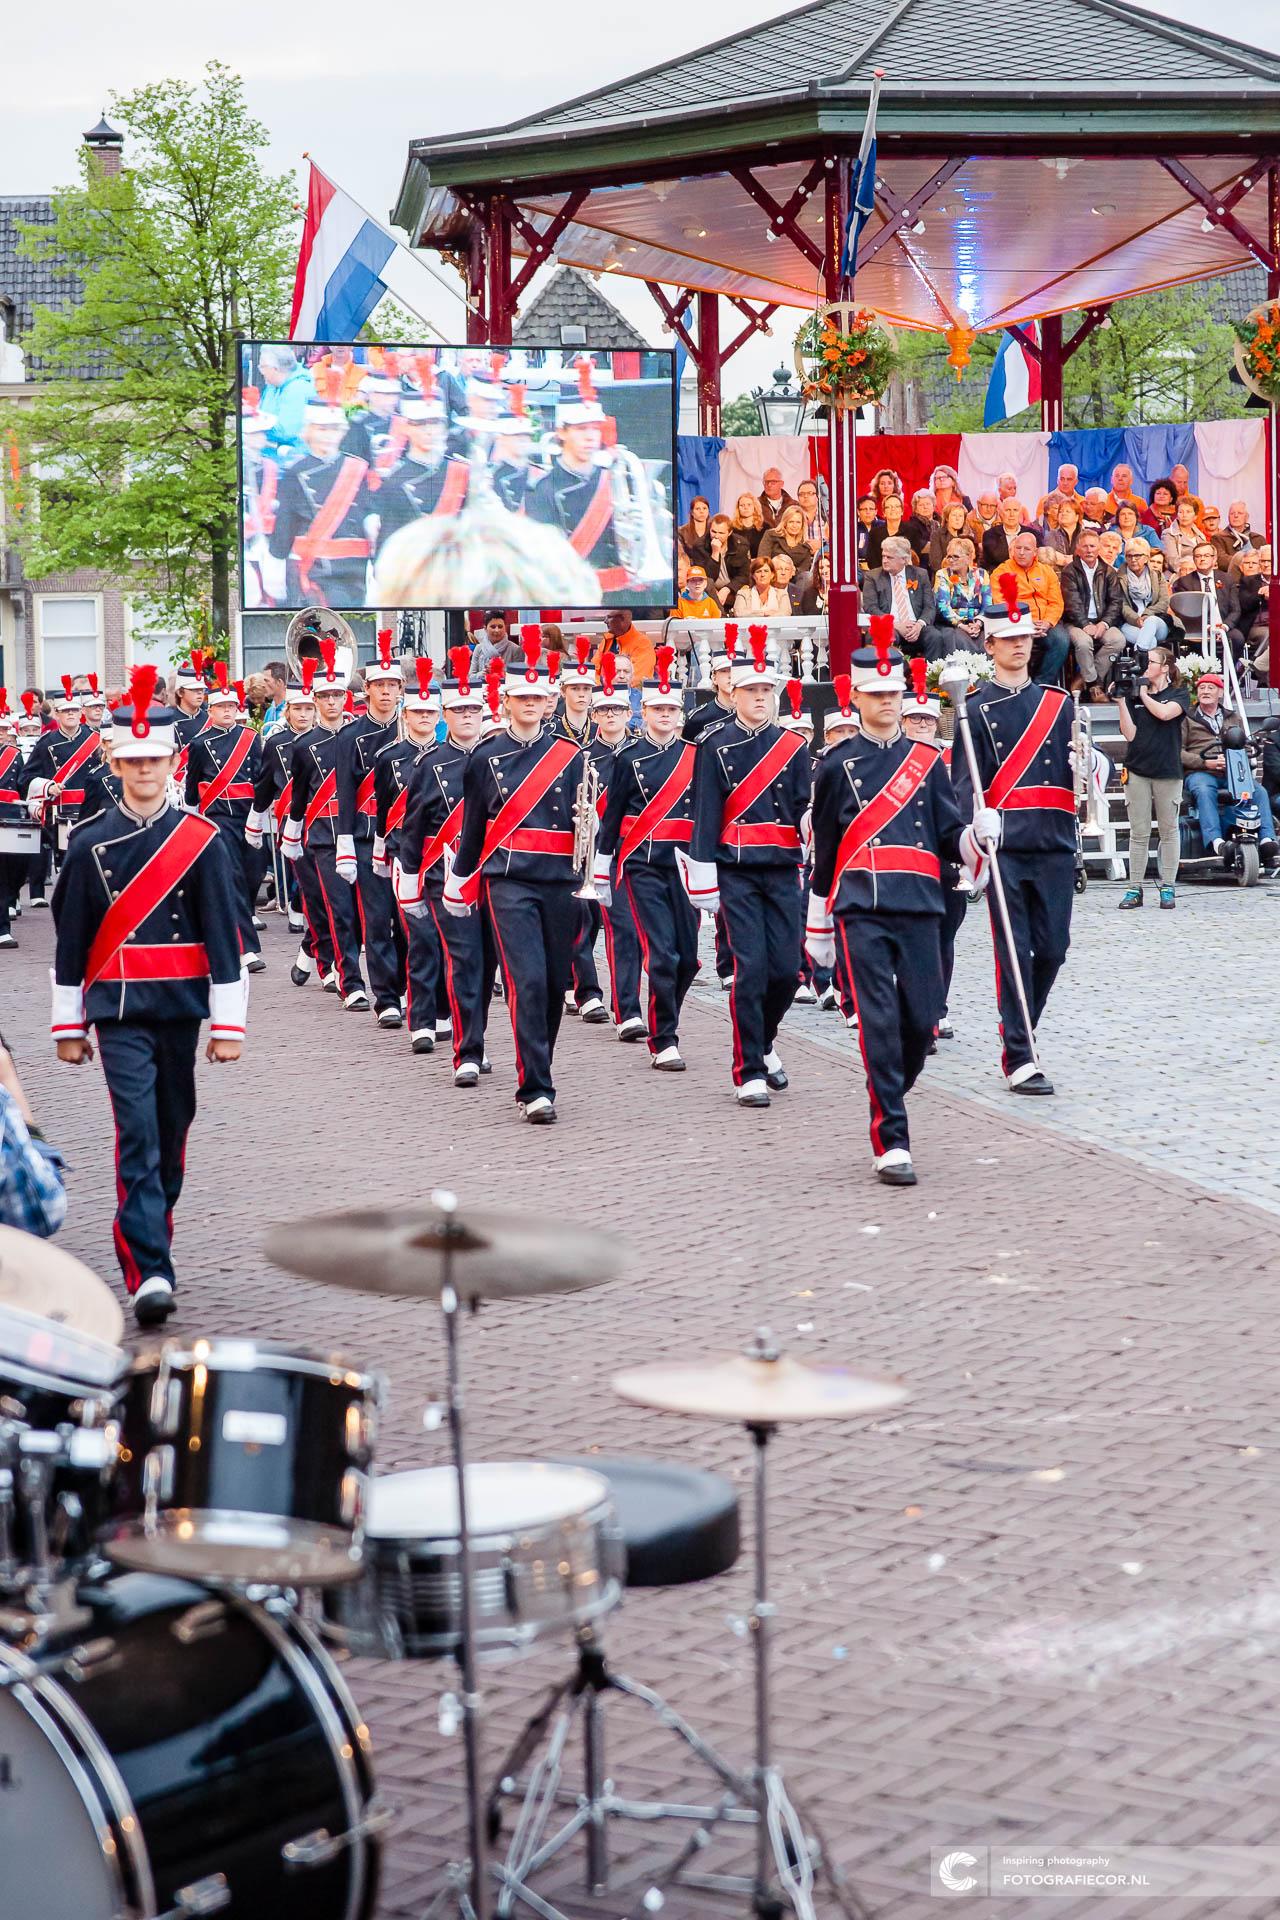 Jong KTK | jeugdband | Kampen | fotografie | fotograaf | © fotografiecor.nl | KOV